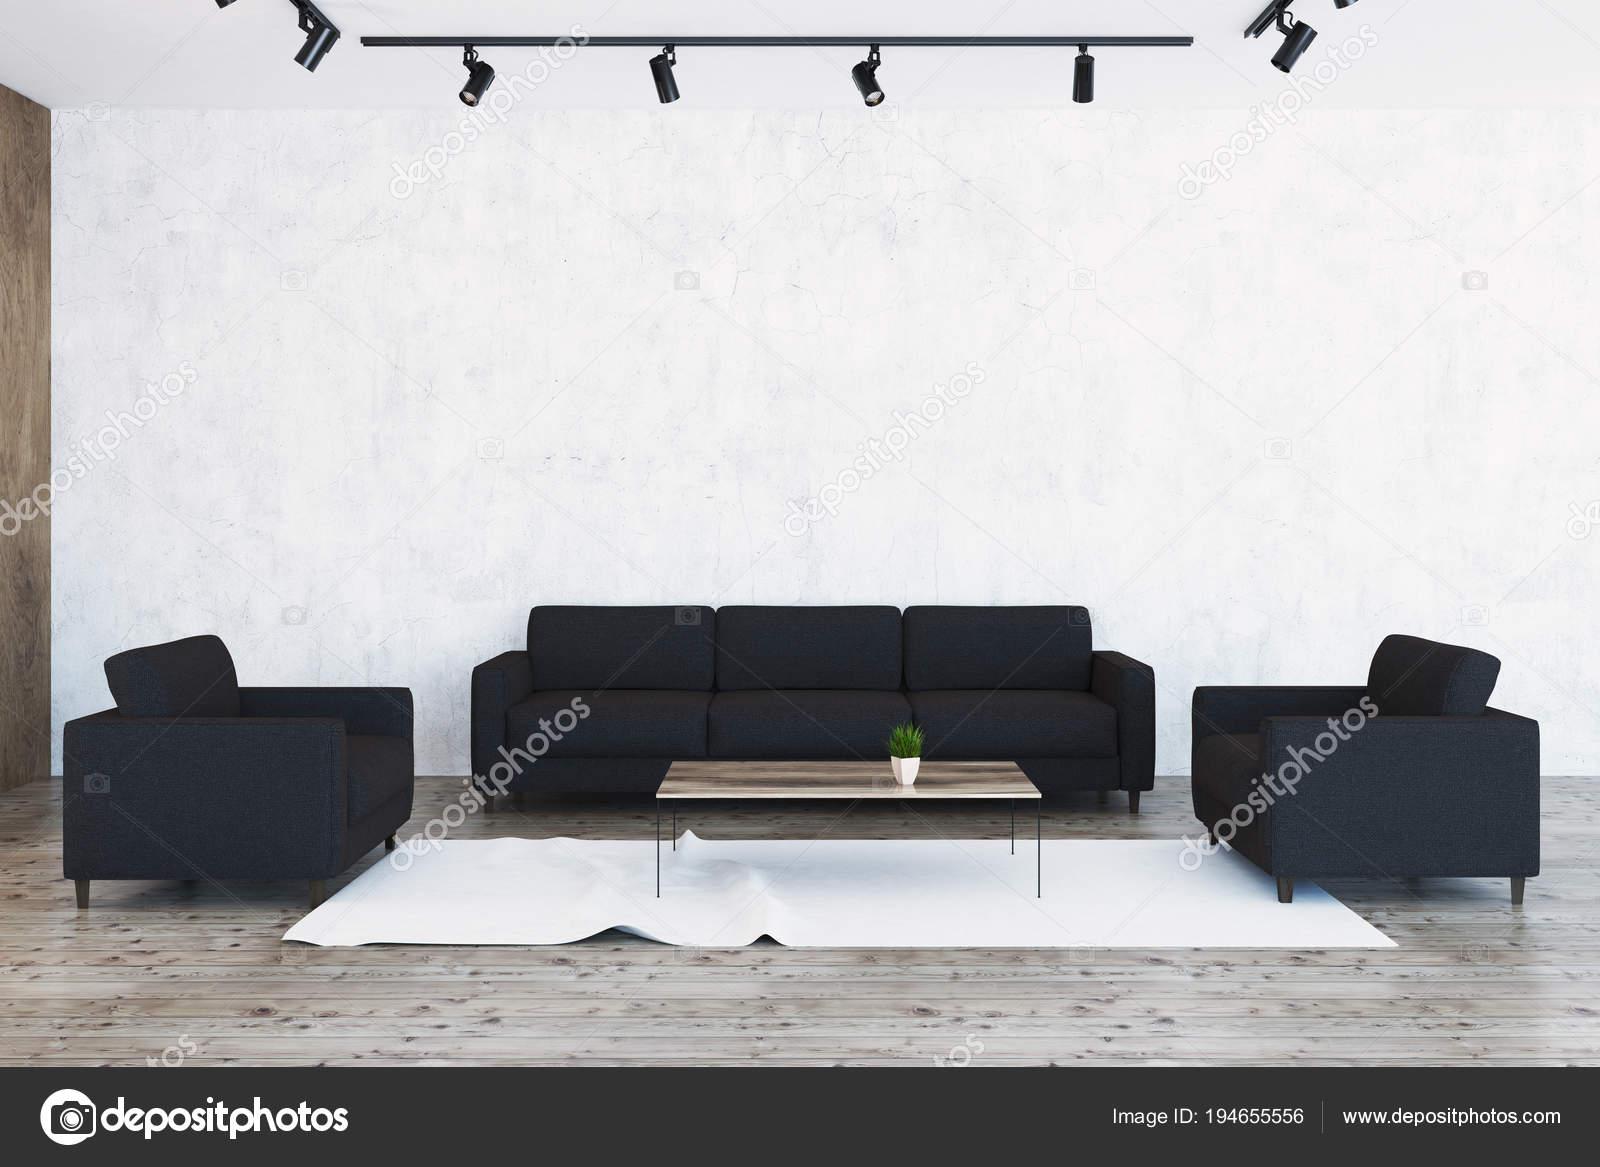 Woonkamer Met Beton : Beton woonkamer zwarte fauteuils sofa u2014 stockfoto © denisismagilov